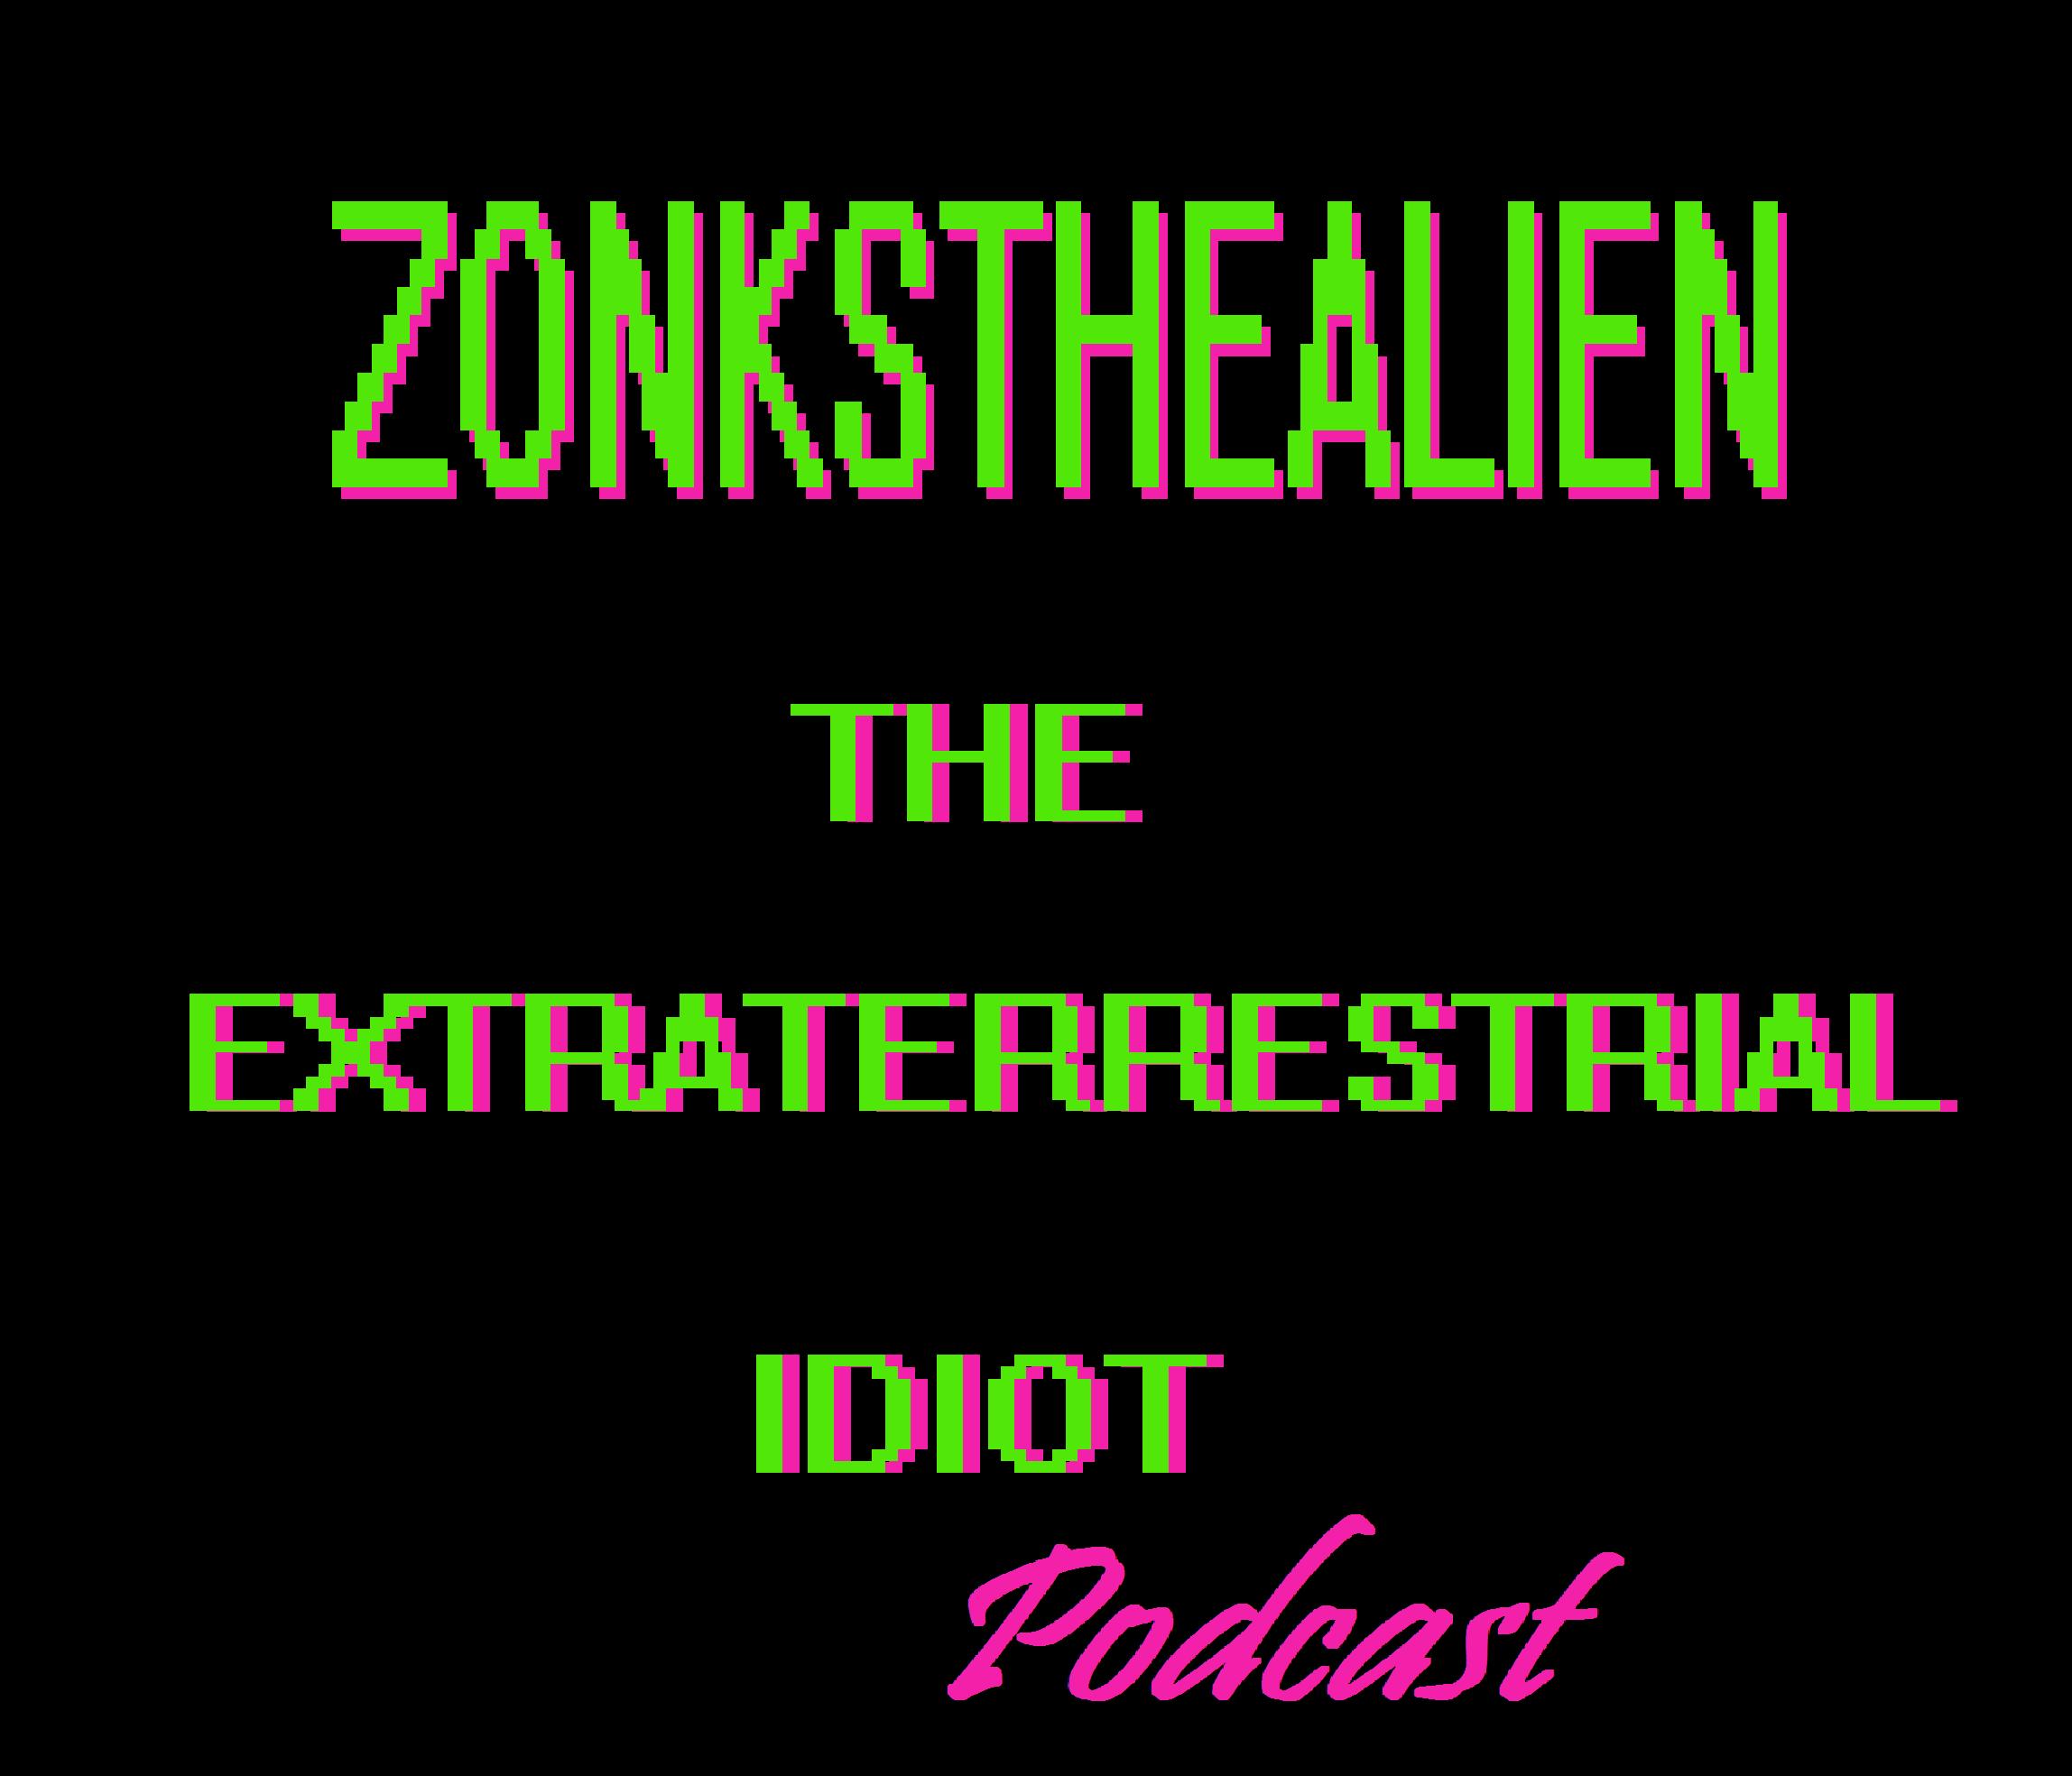 Zonksthealien's The Extraterrestrial Idiot show image